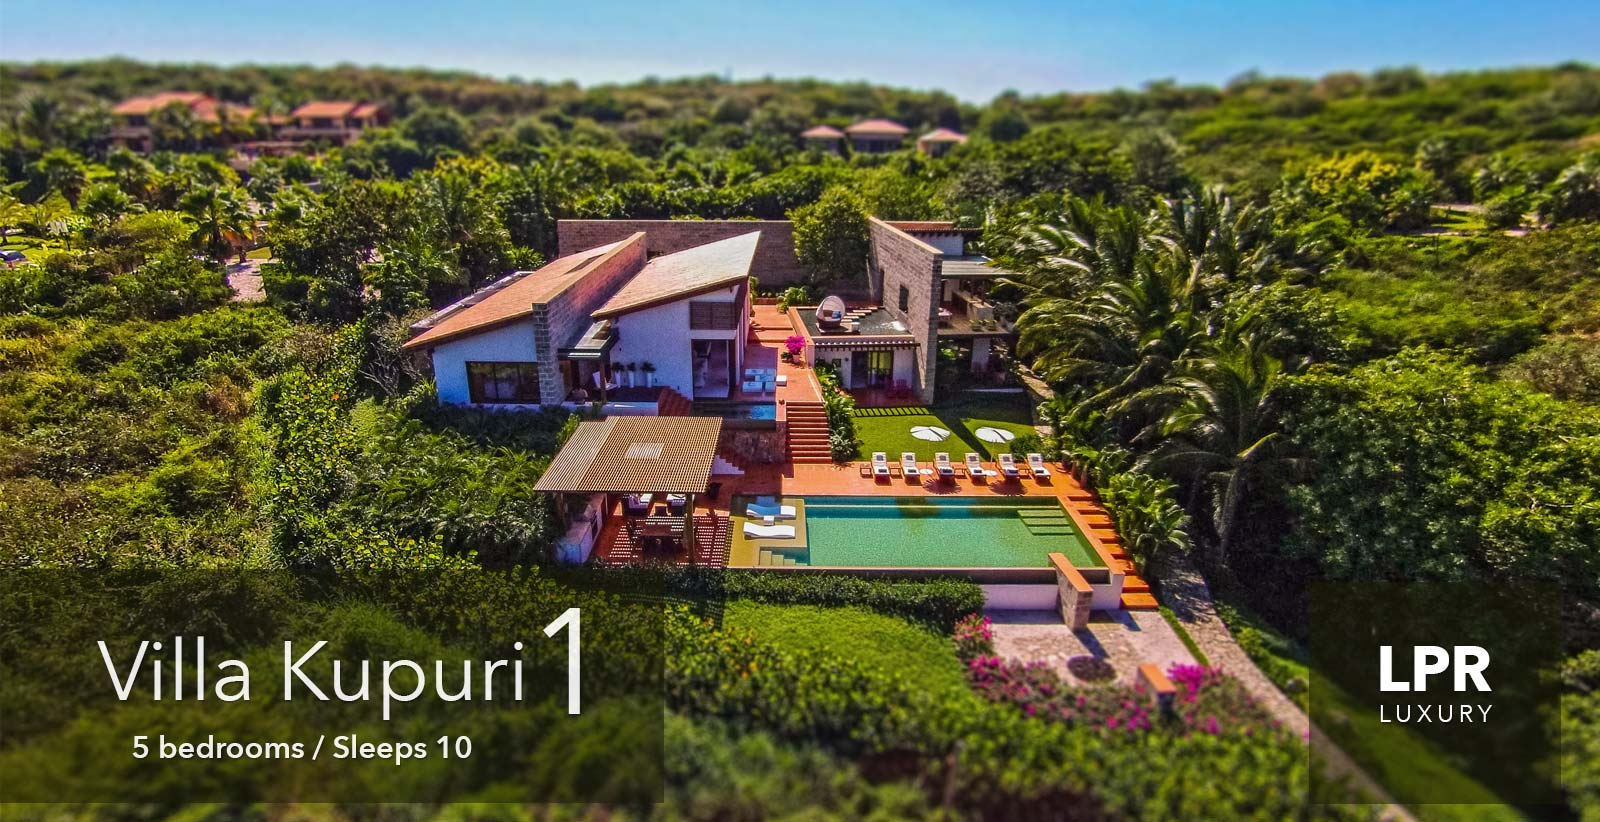 Villa Kupuri 1 - Modern luxury at the Punta Mita Resort, Riviera Nayarit, Mexico